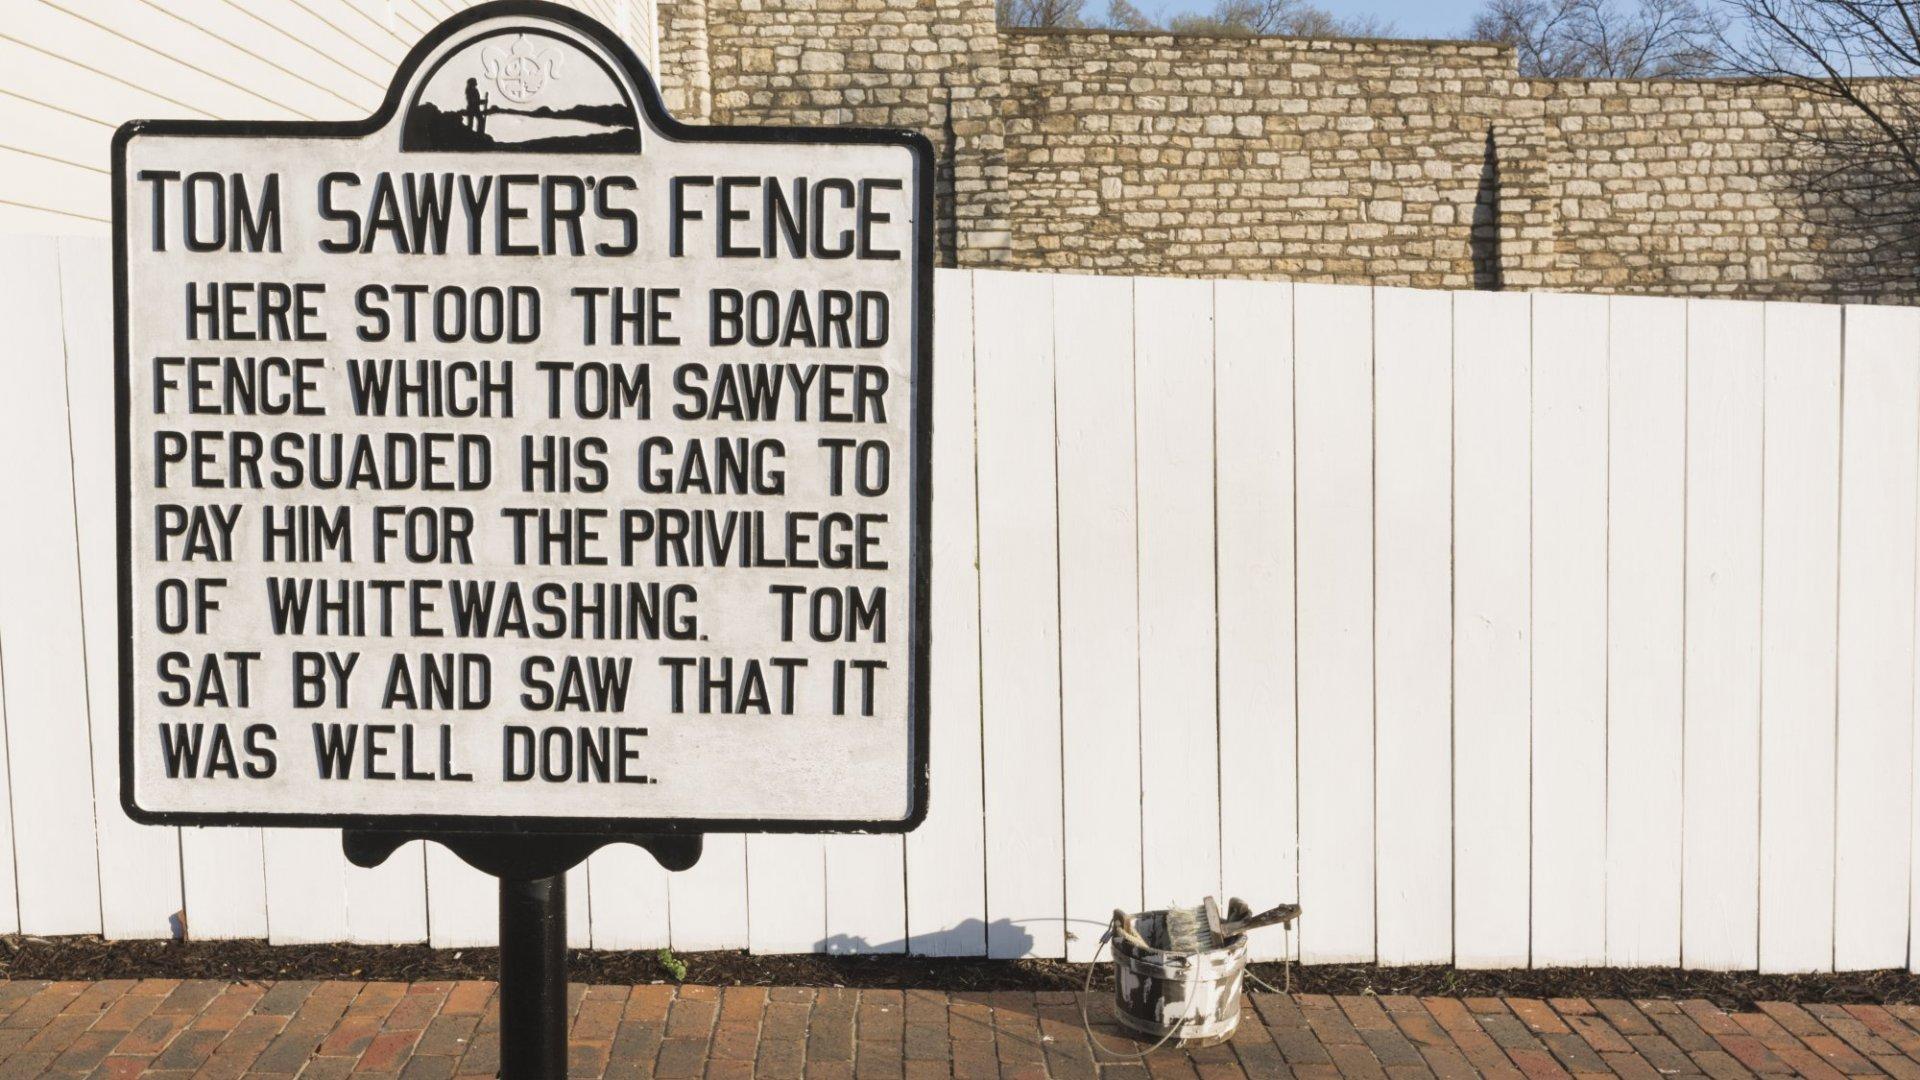 5 Ways to Use the Tom Sawyer Effect to Grow Your Company